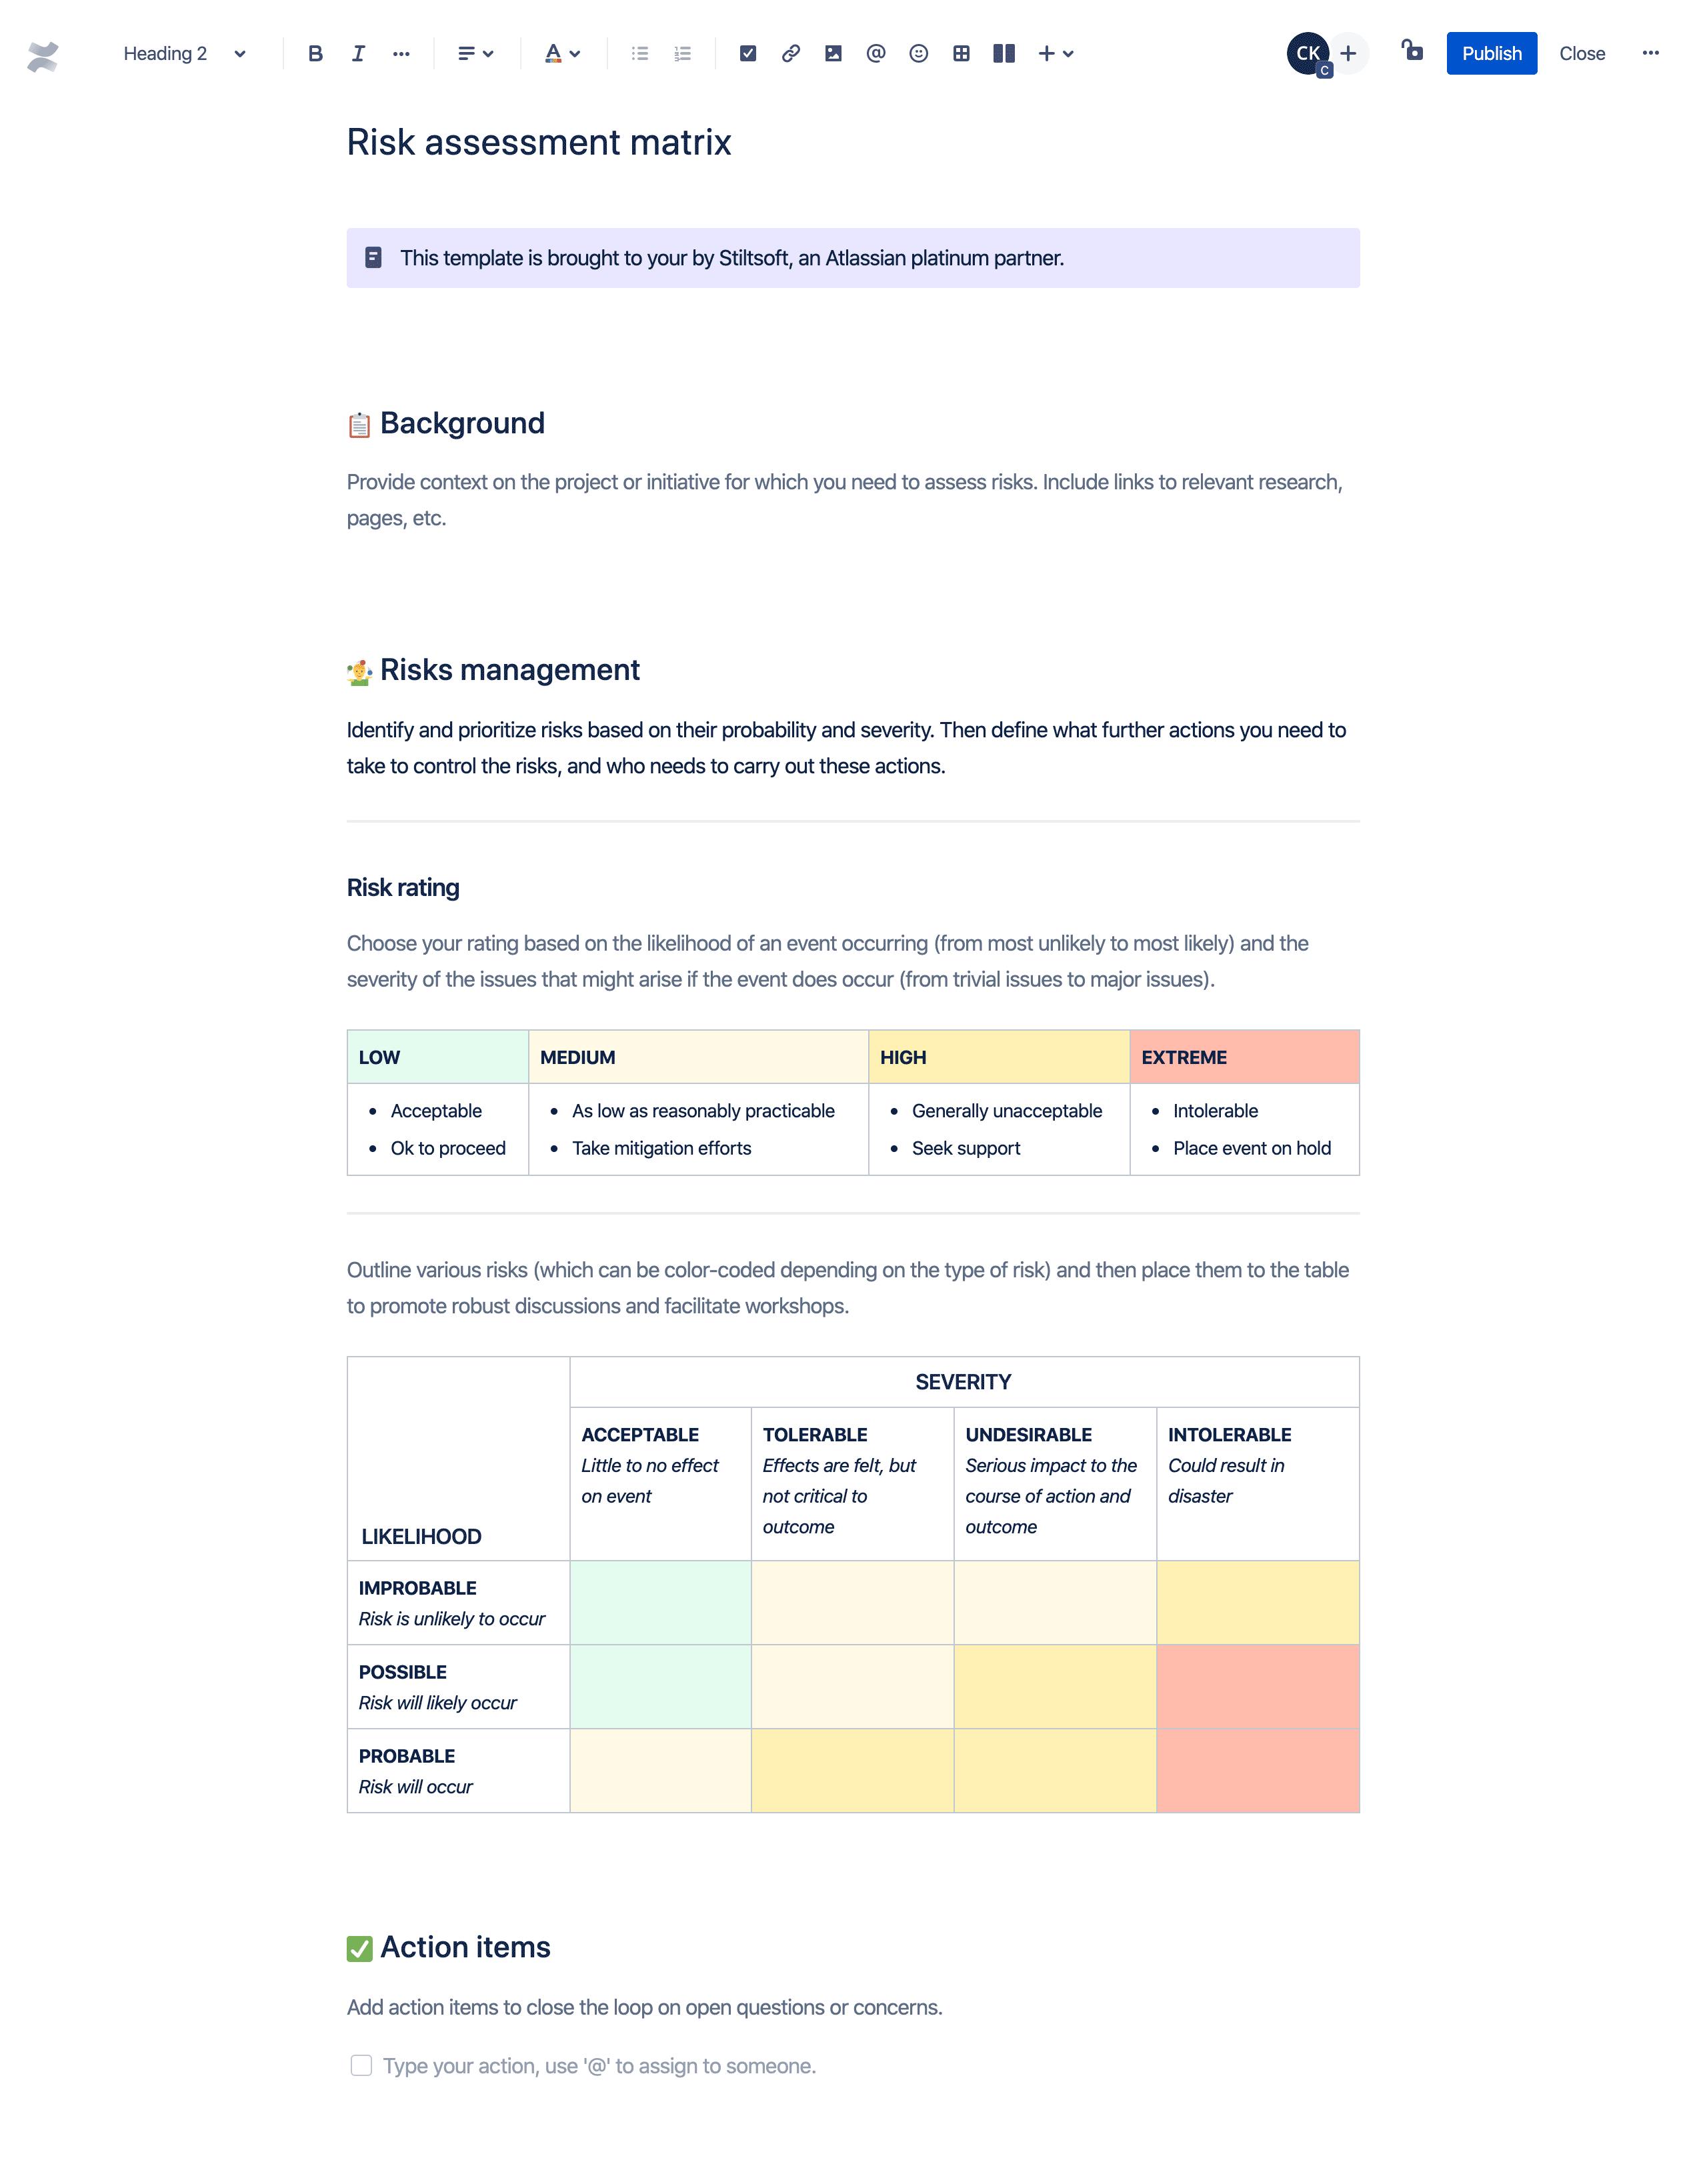 Шаблон матрицы управления рисками